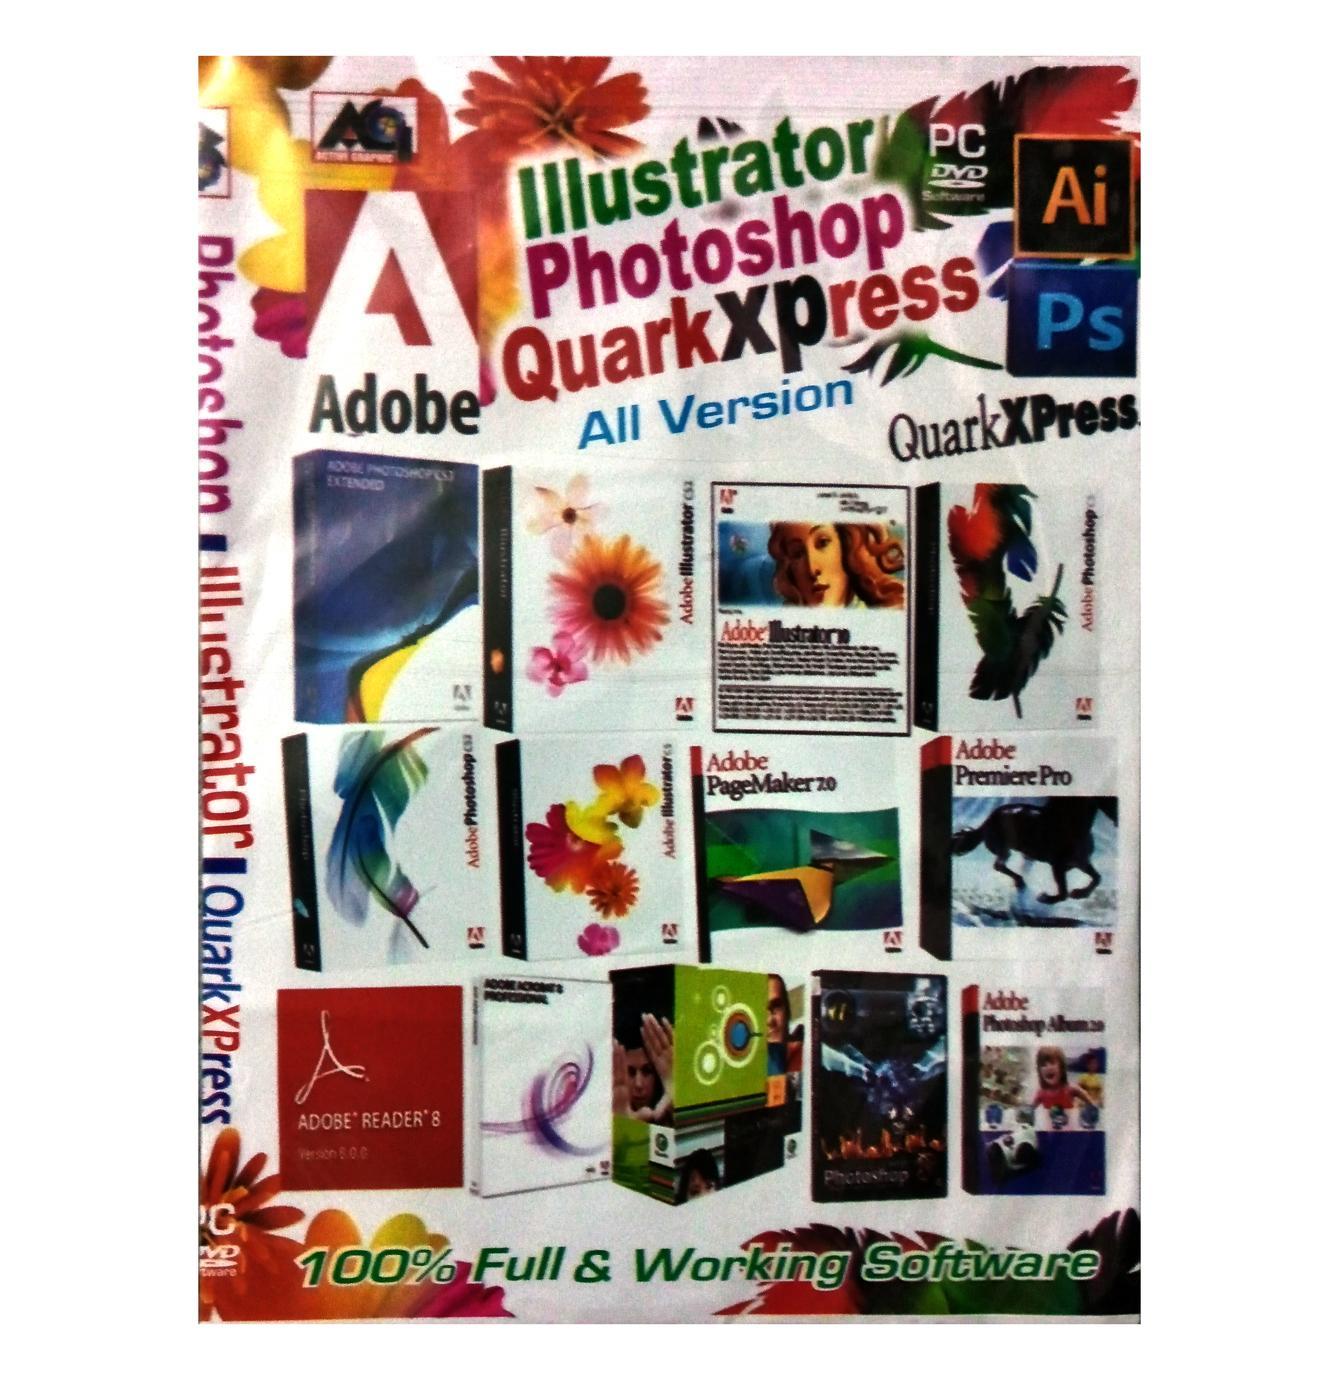 Adobe Illustrator, Photoshop and QuarkXpress full Version _DVD